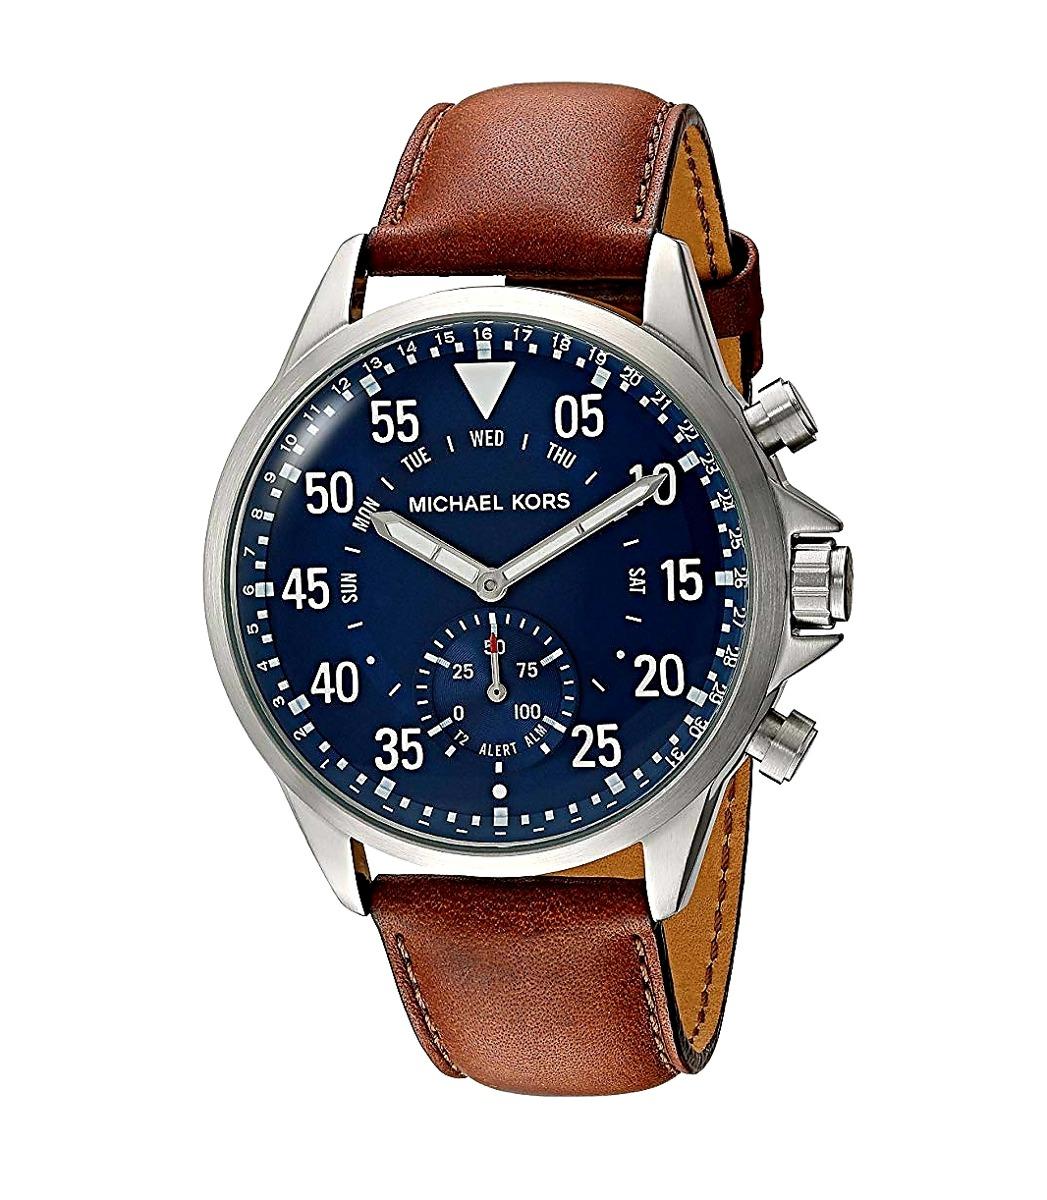 Michael Híbrido Access Reloj Smartwatch Kors Mkt4006 PnNOkX8w0Z